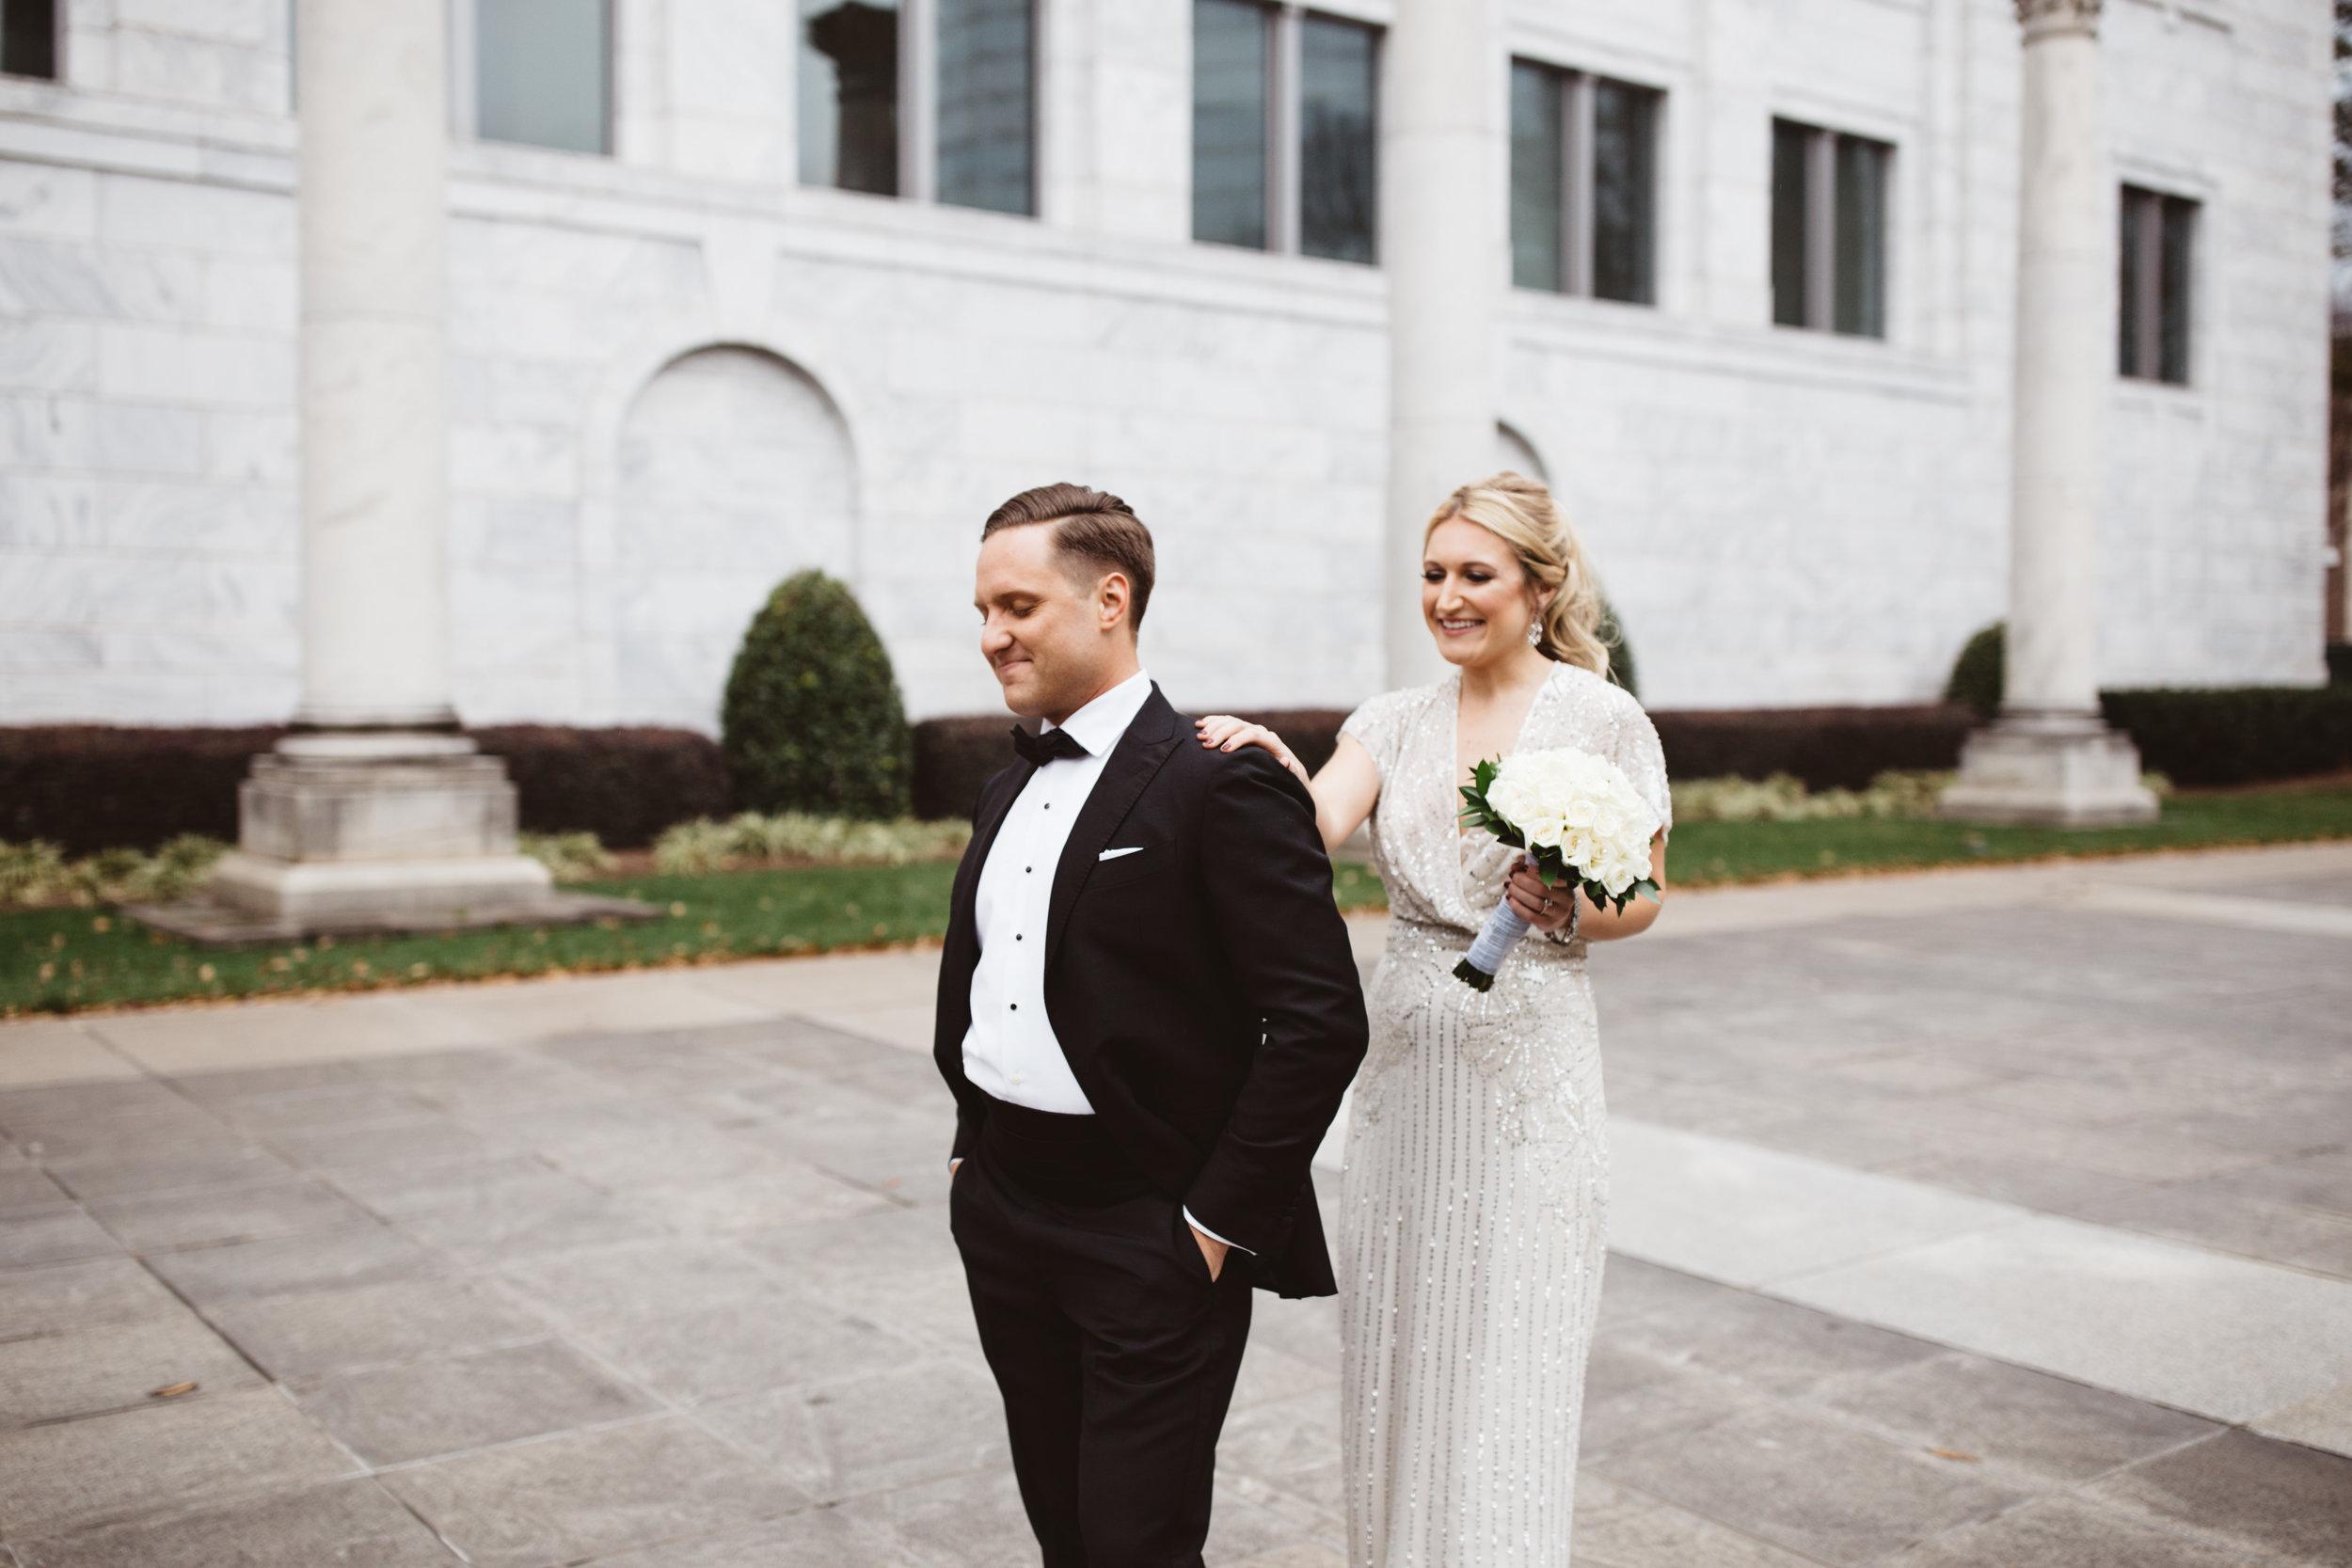 Mattie Bell Photography- Kelly & Zack Wedding Atlanta Brewery -97.jpg